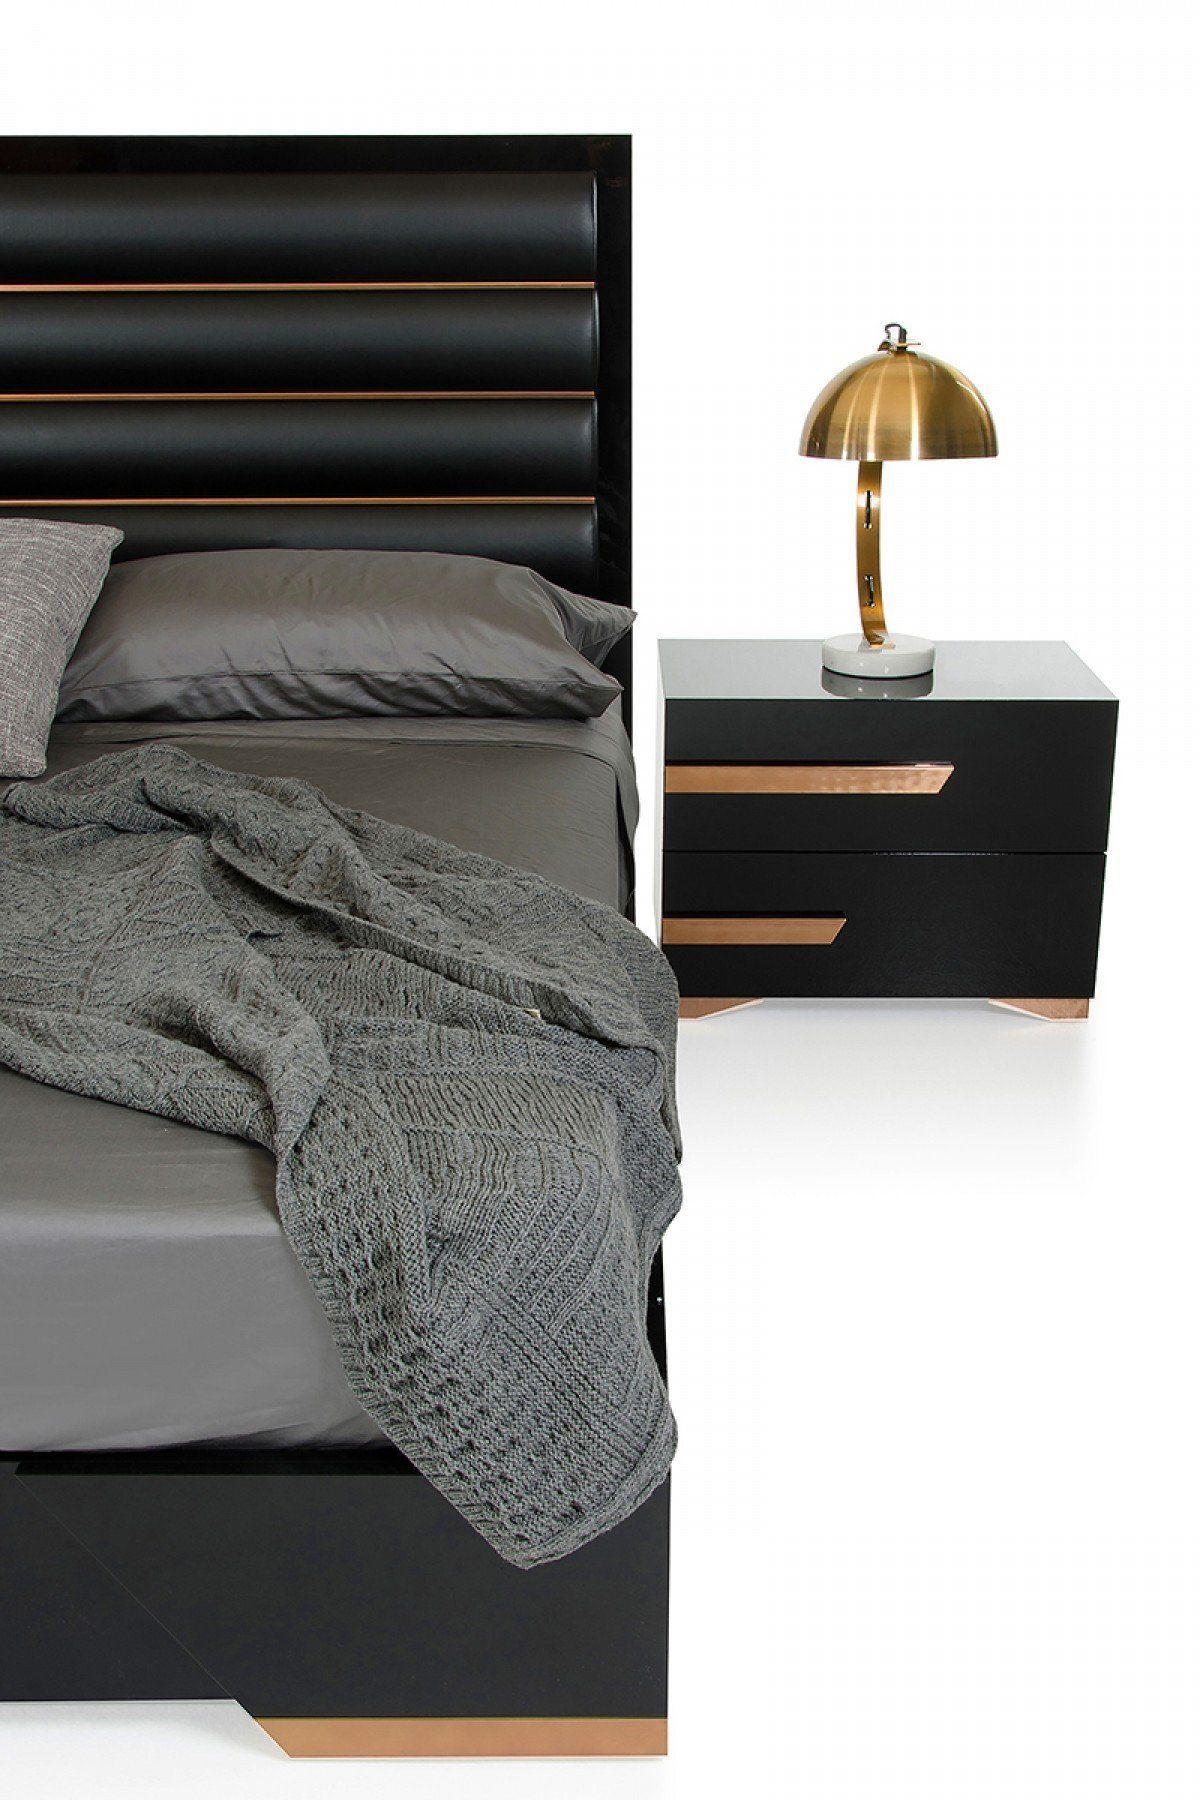 VIG Furniture Nova Domus Romeo Italian Modern Black